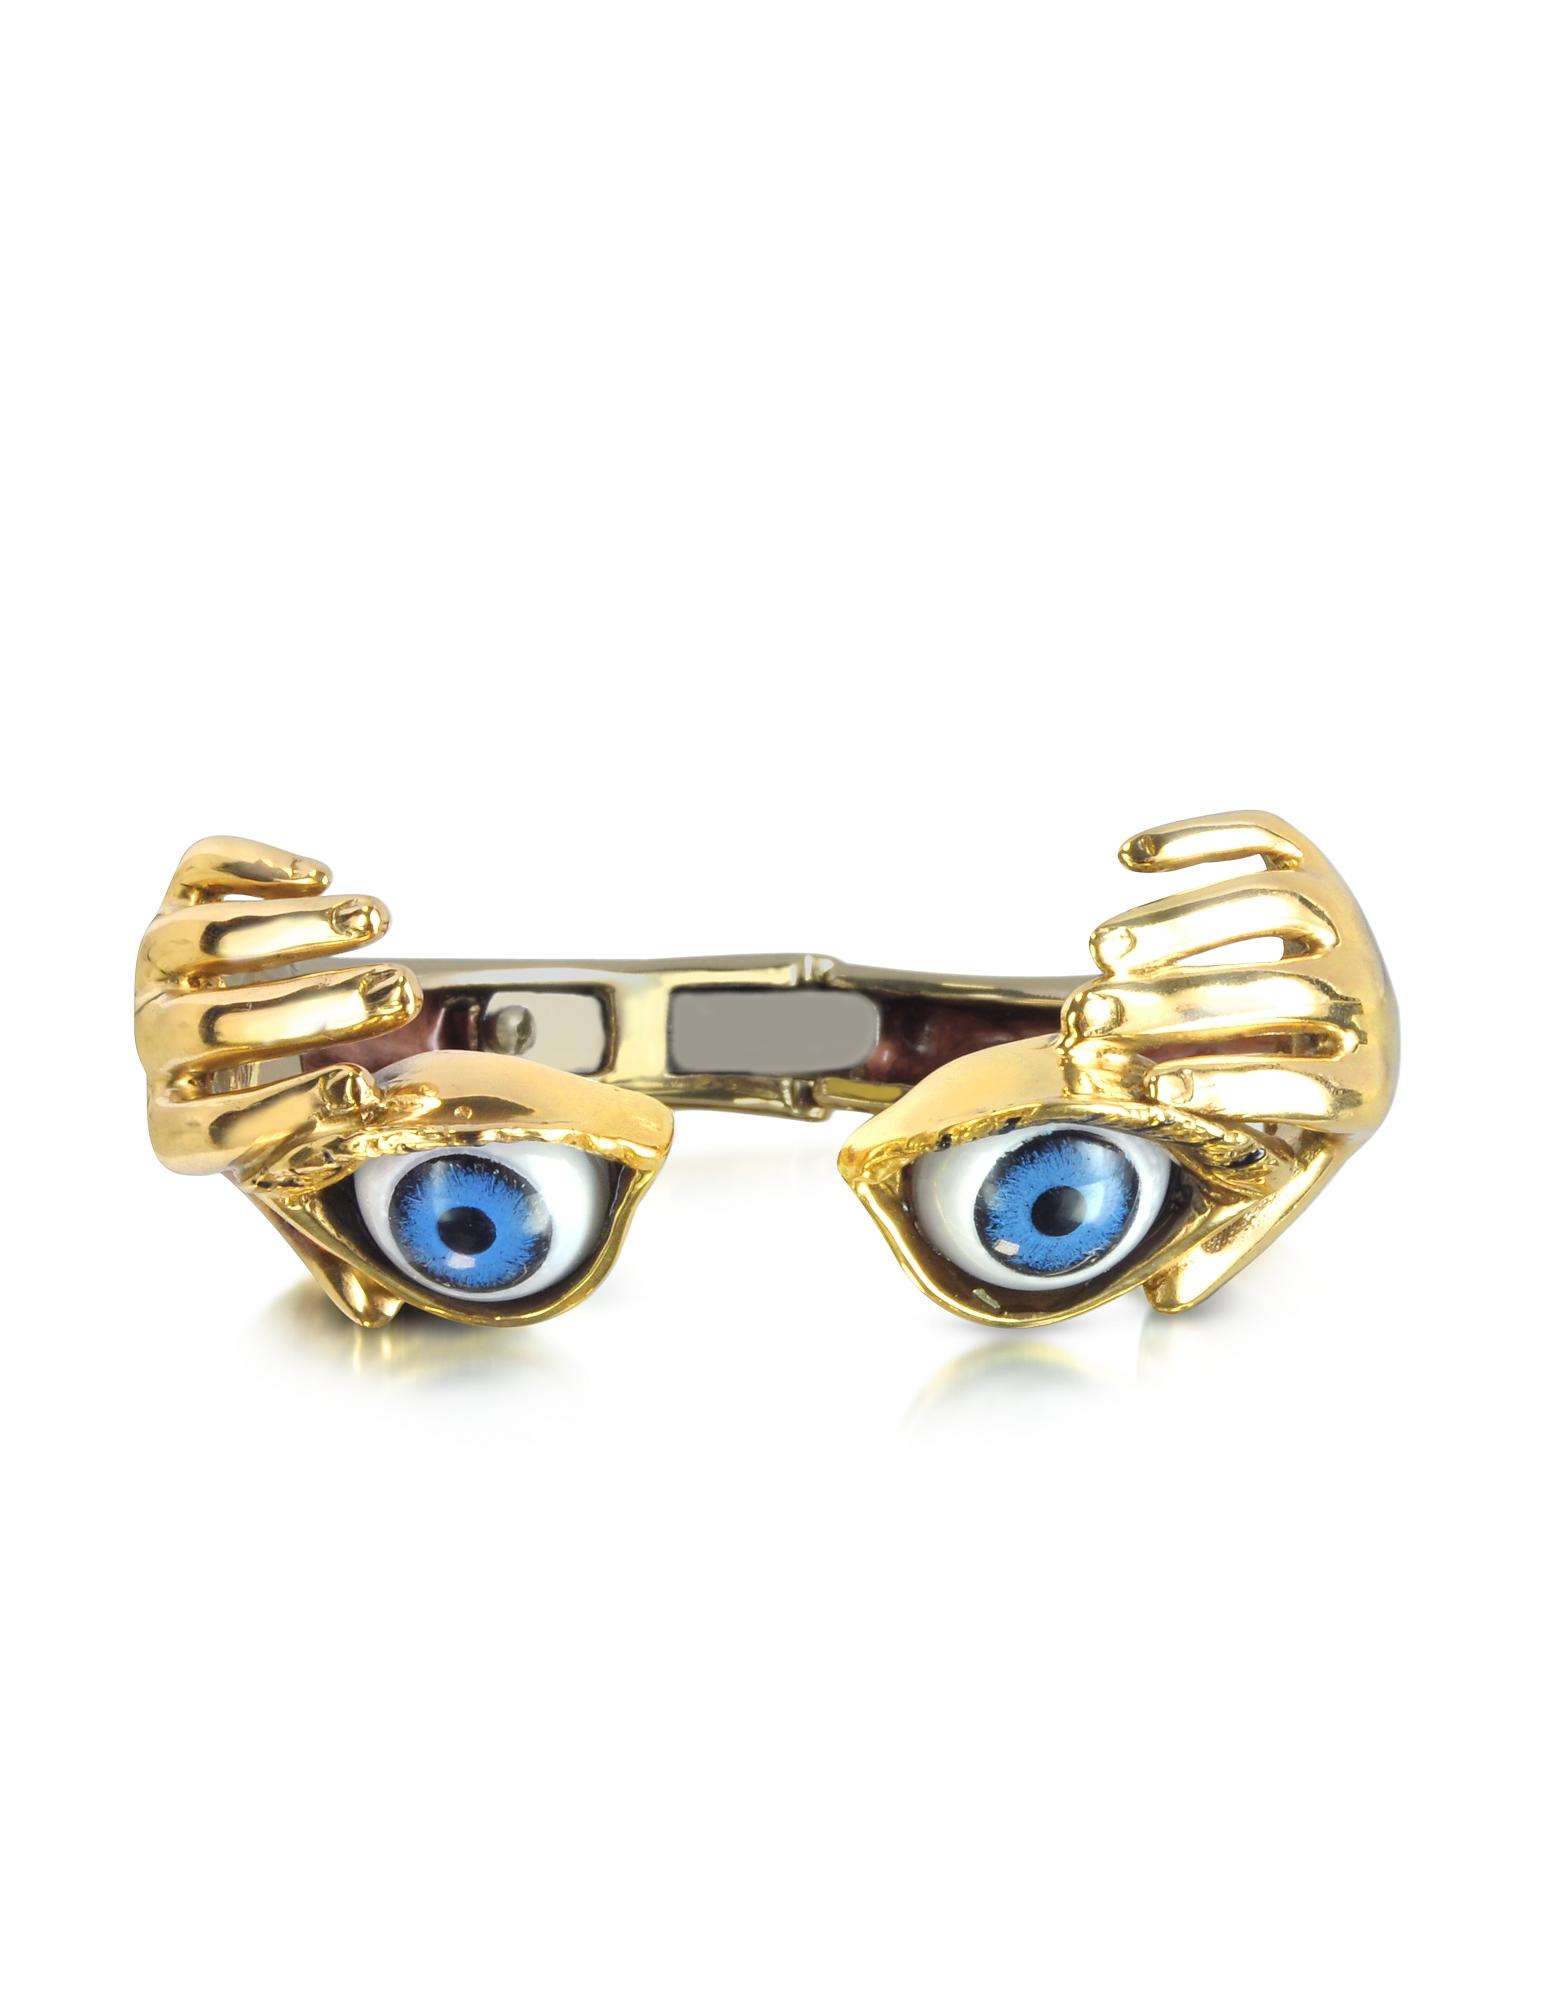 Bernard Delettrez Bracelets, Bronze Hand Stiff Bracelet With Eye